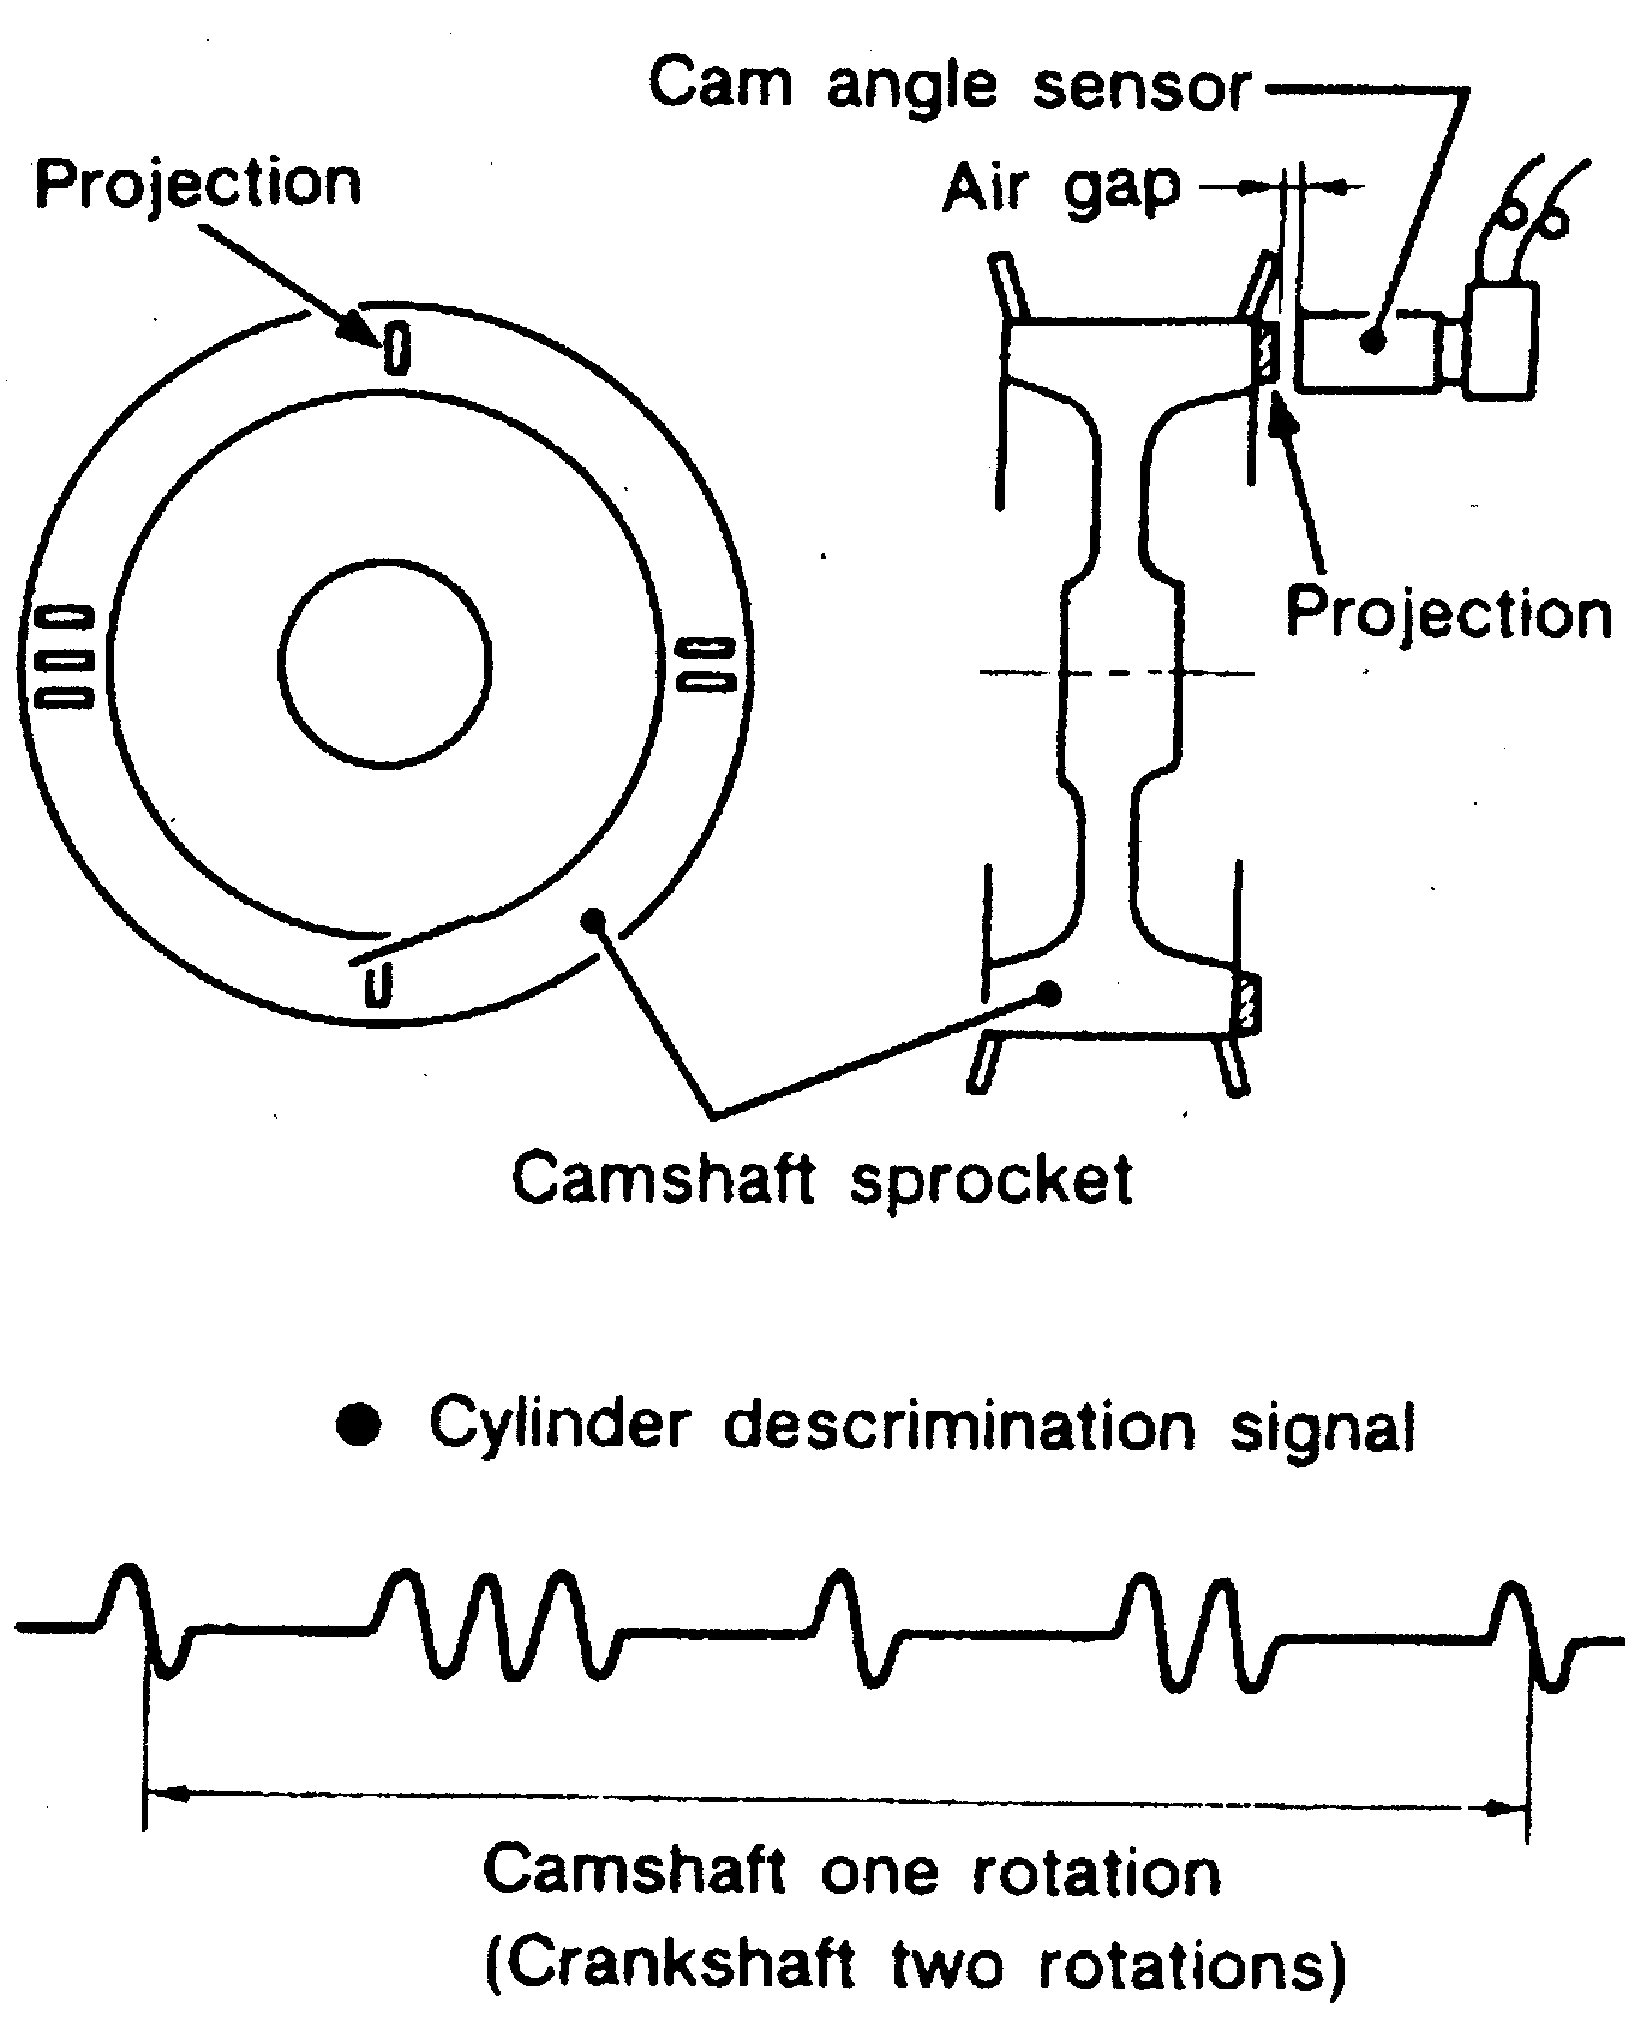 Input Trigger/Subaru Trigger